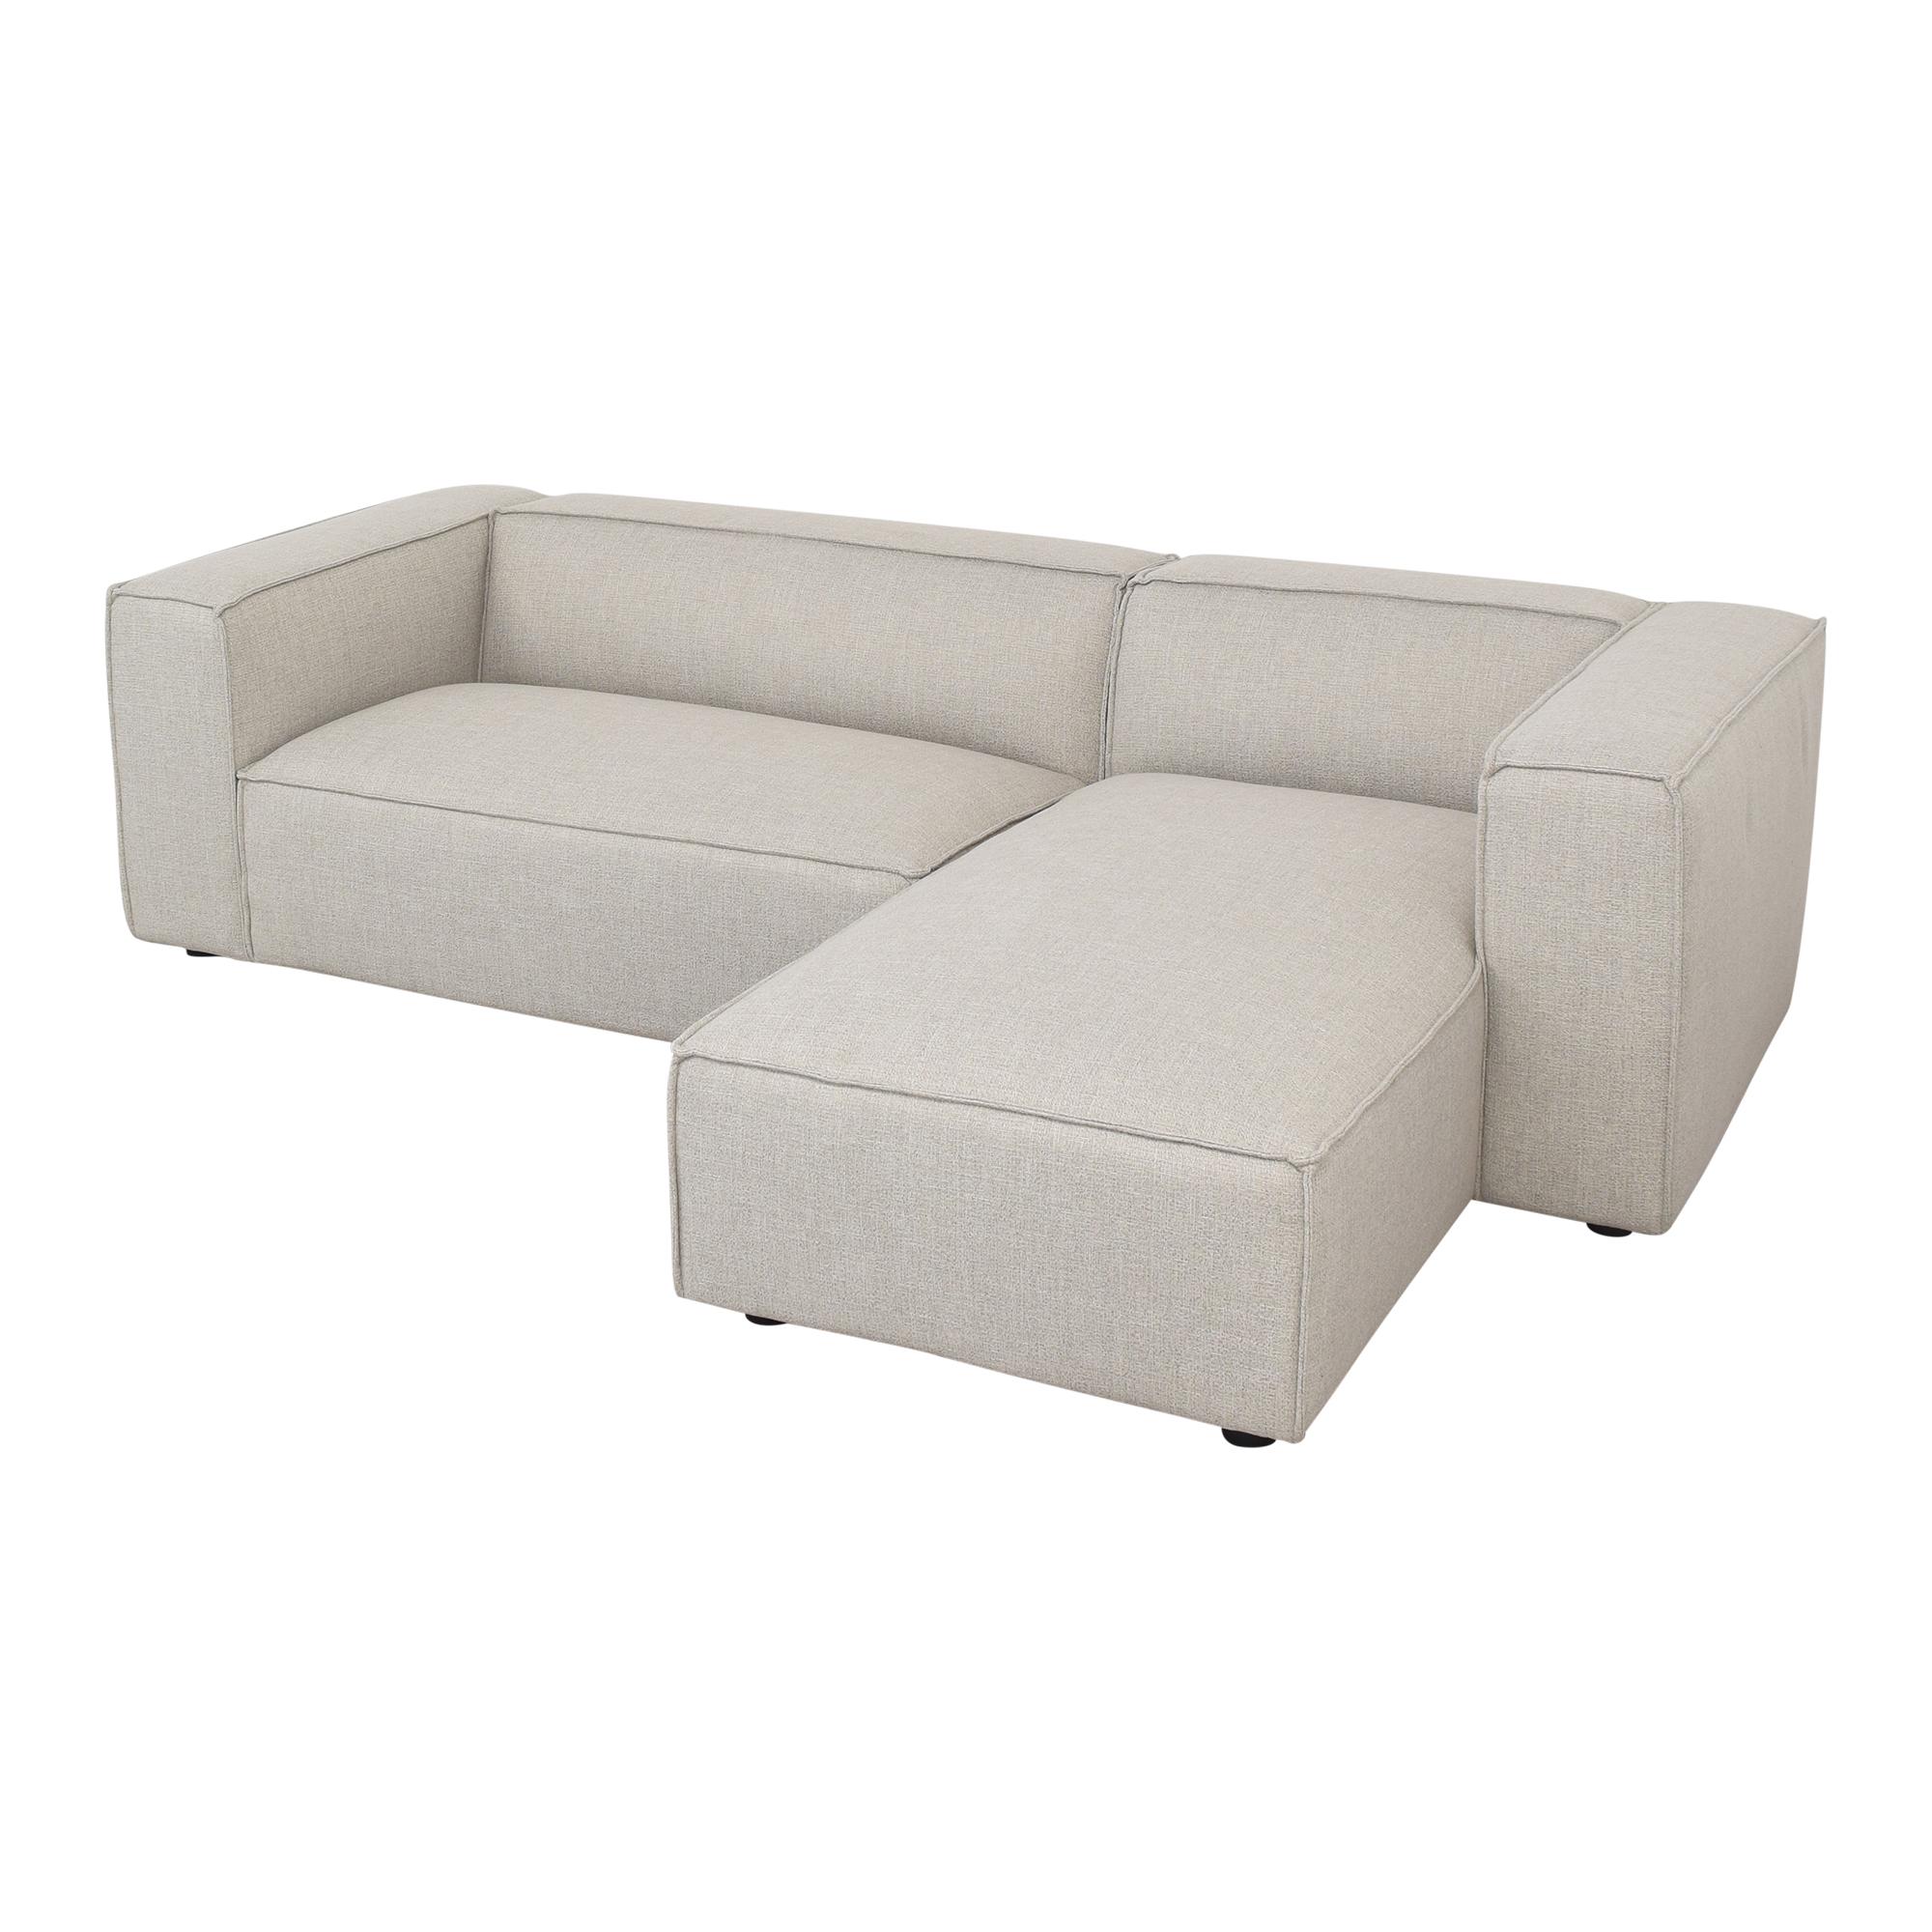 Interior Define Interior Define Gray Sectional Sofa with Chaise price